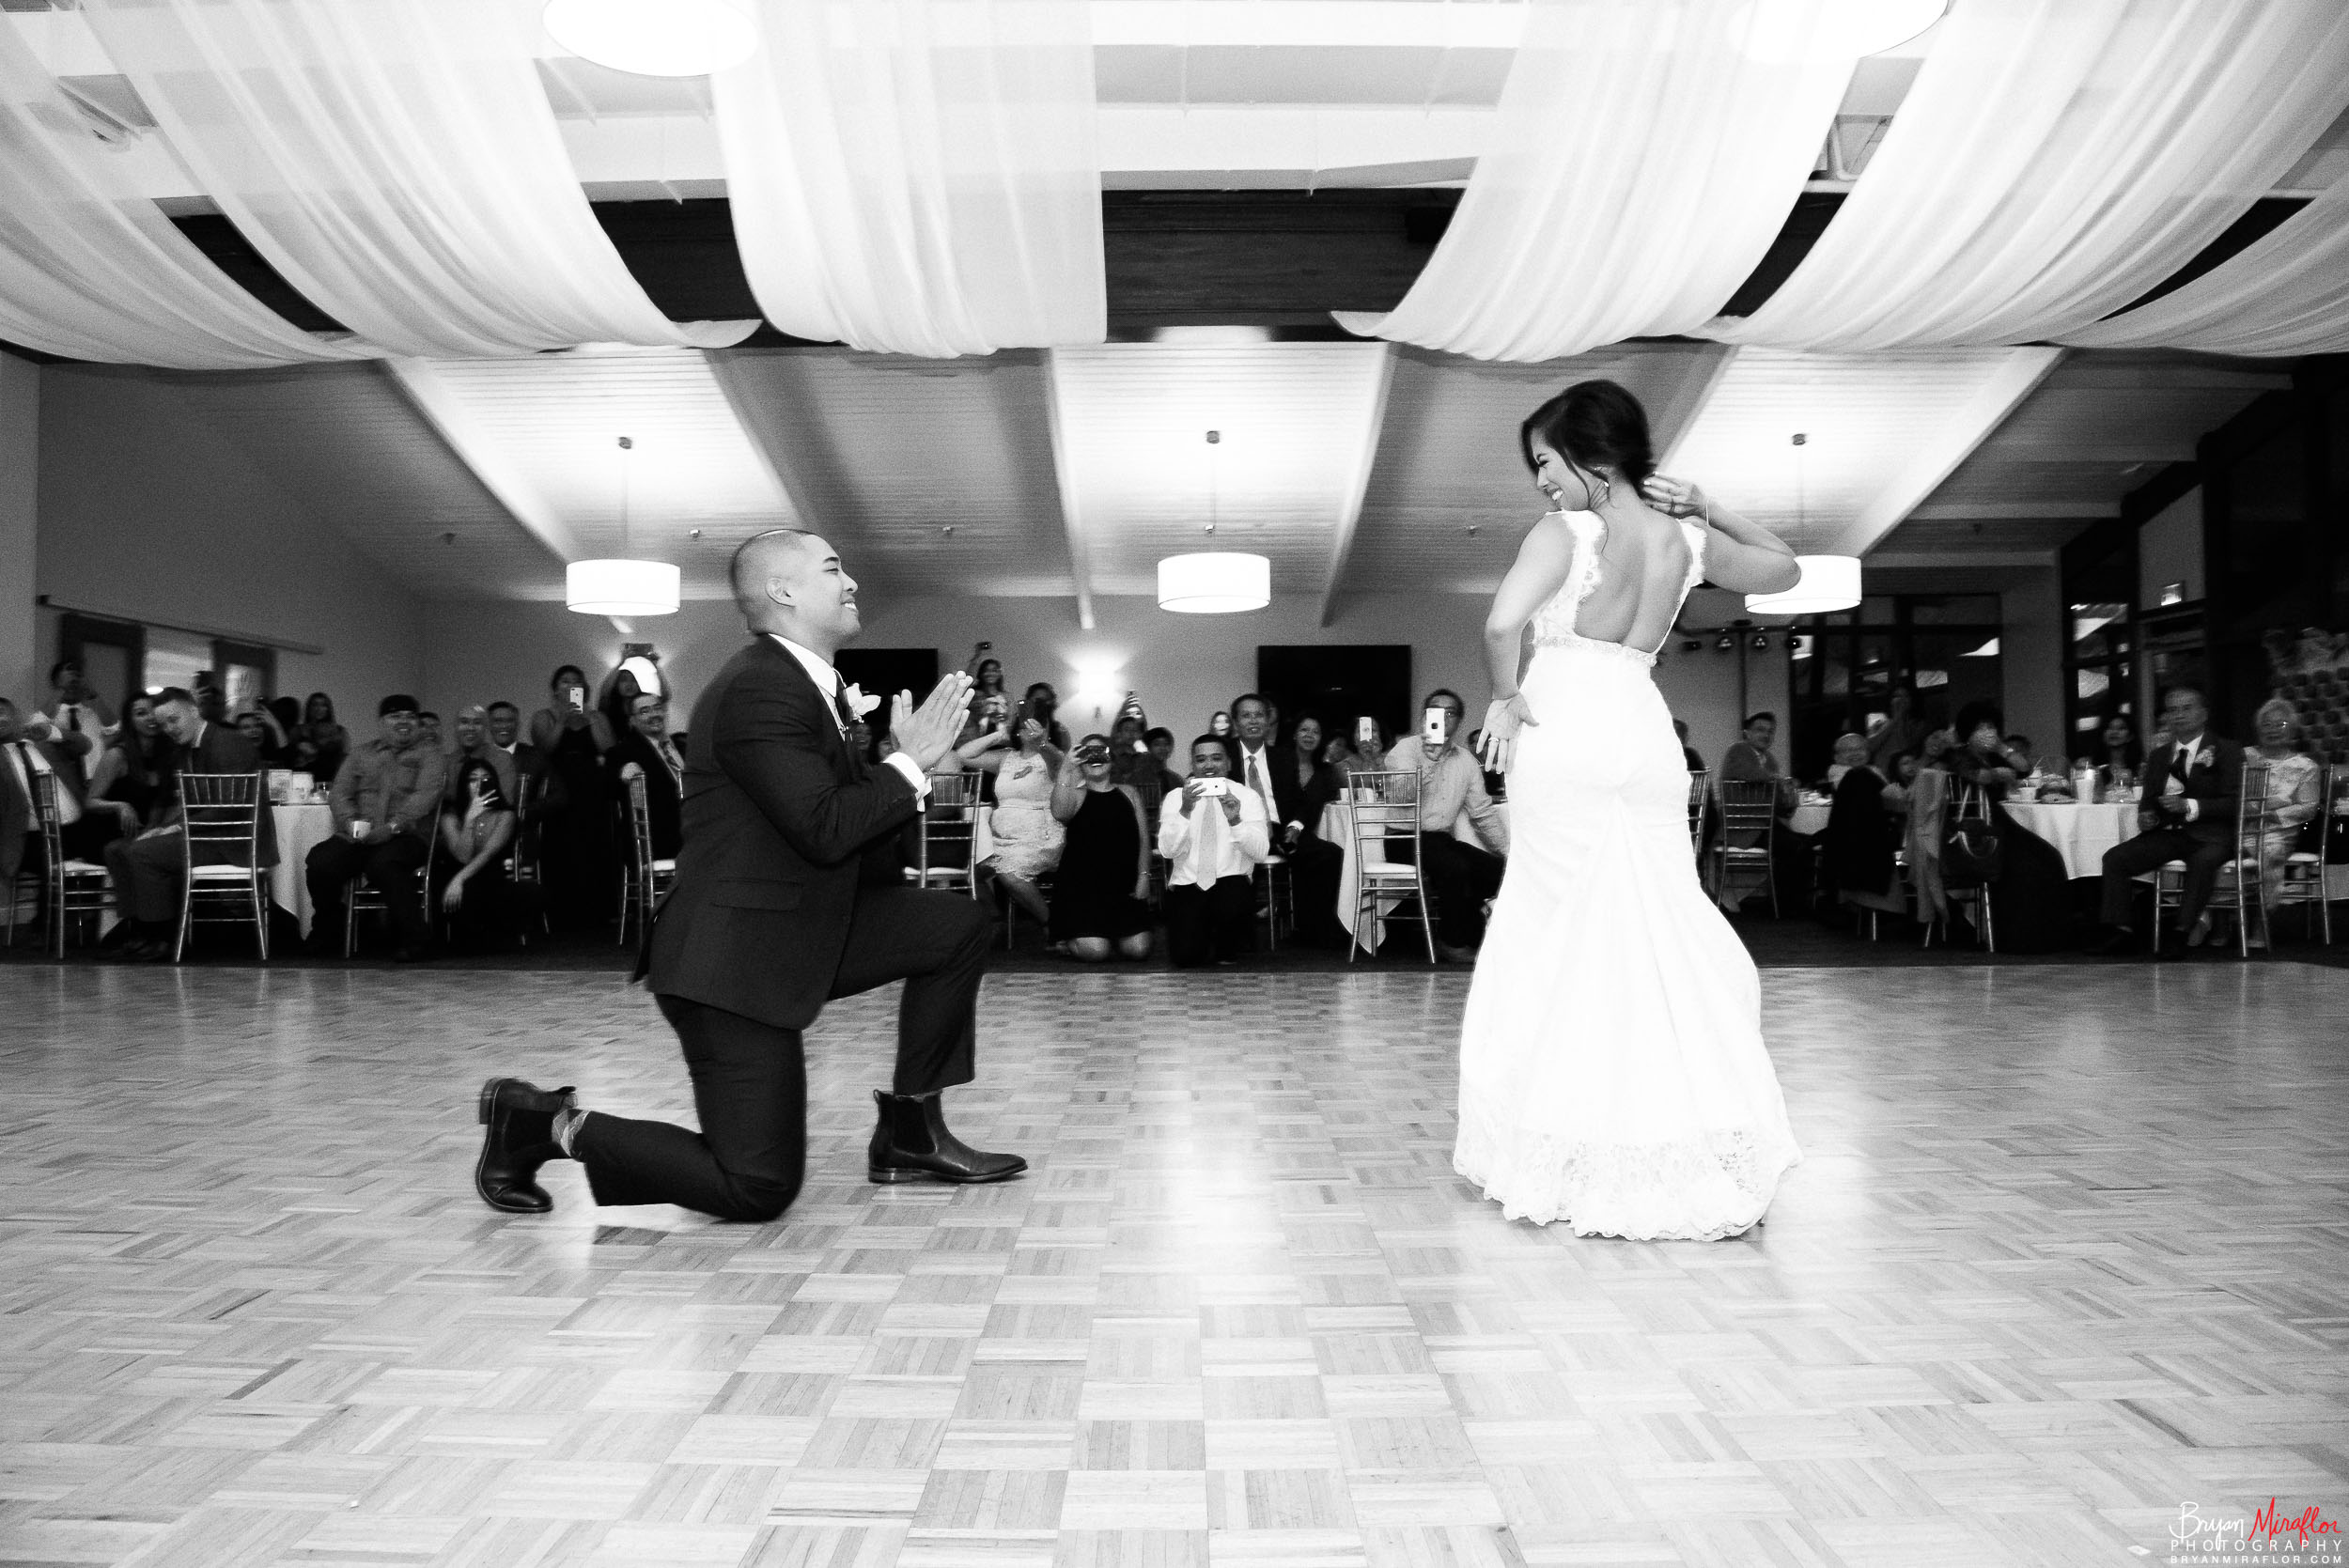 Bryan-Miraflor-Photography-Trisha-Dexter-Married-20170923-068.jpg